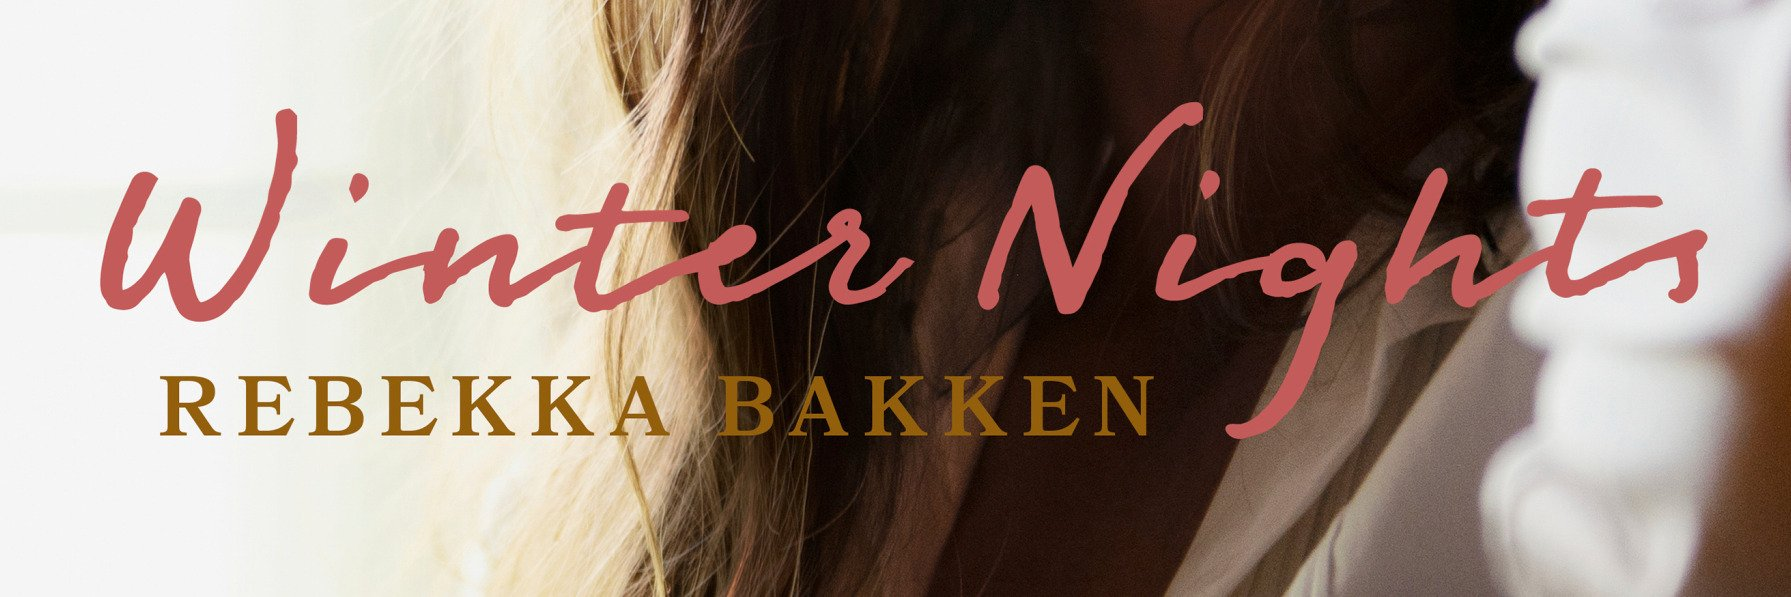 Album Rebekki Bakken na zimowe wieczory